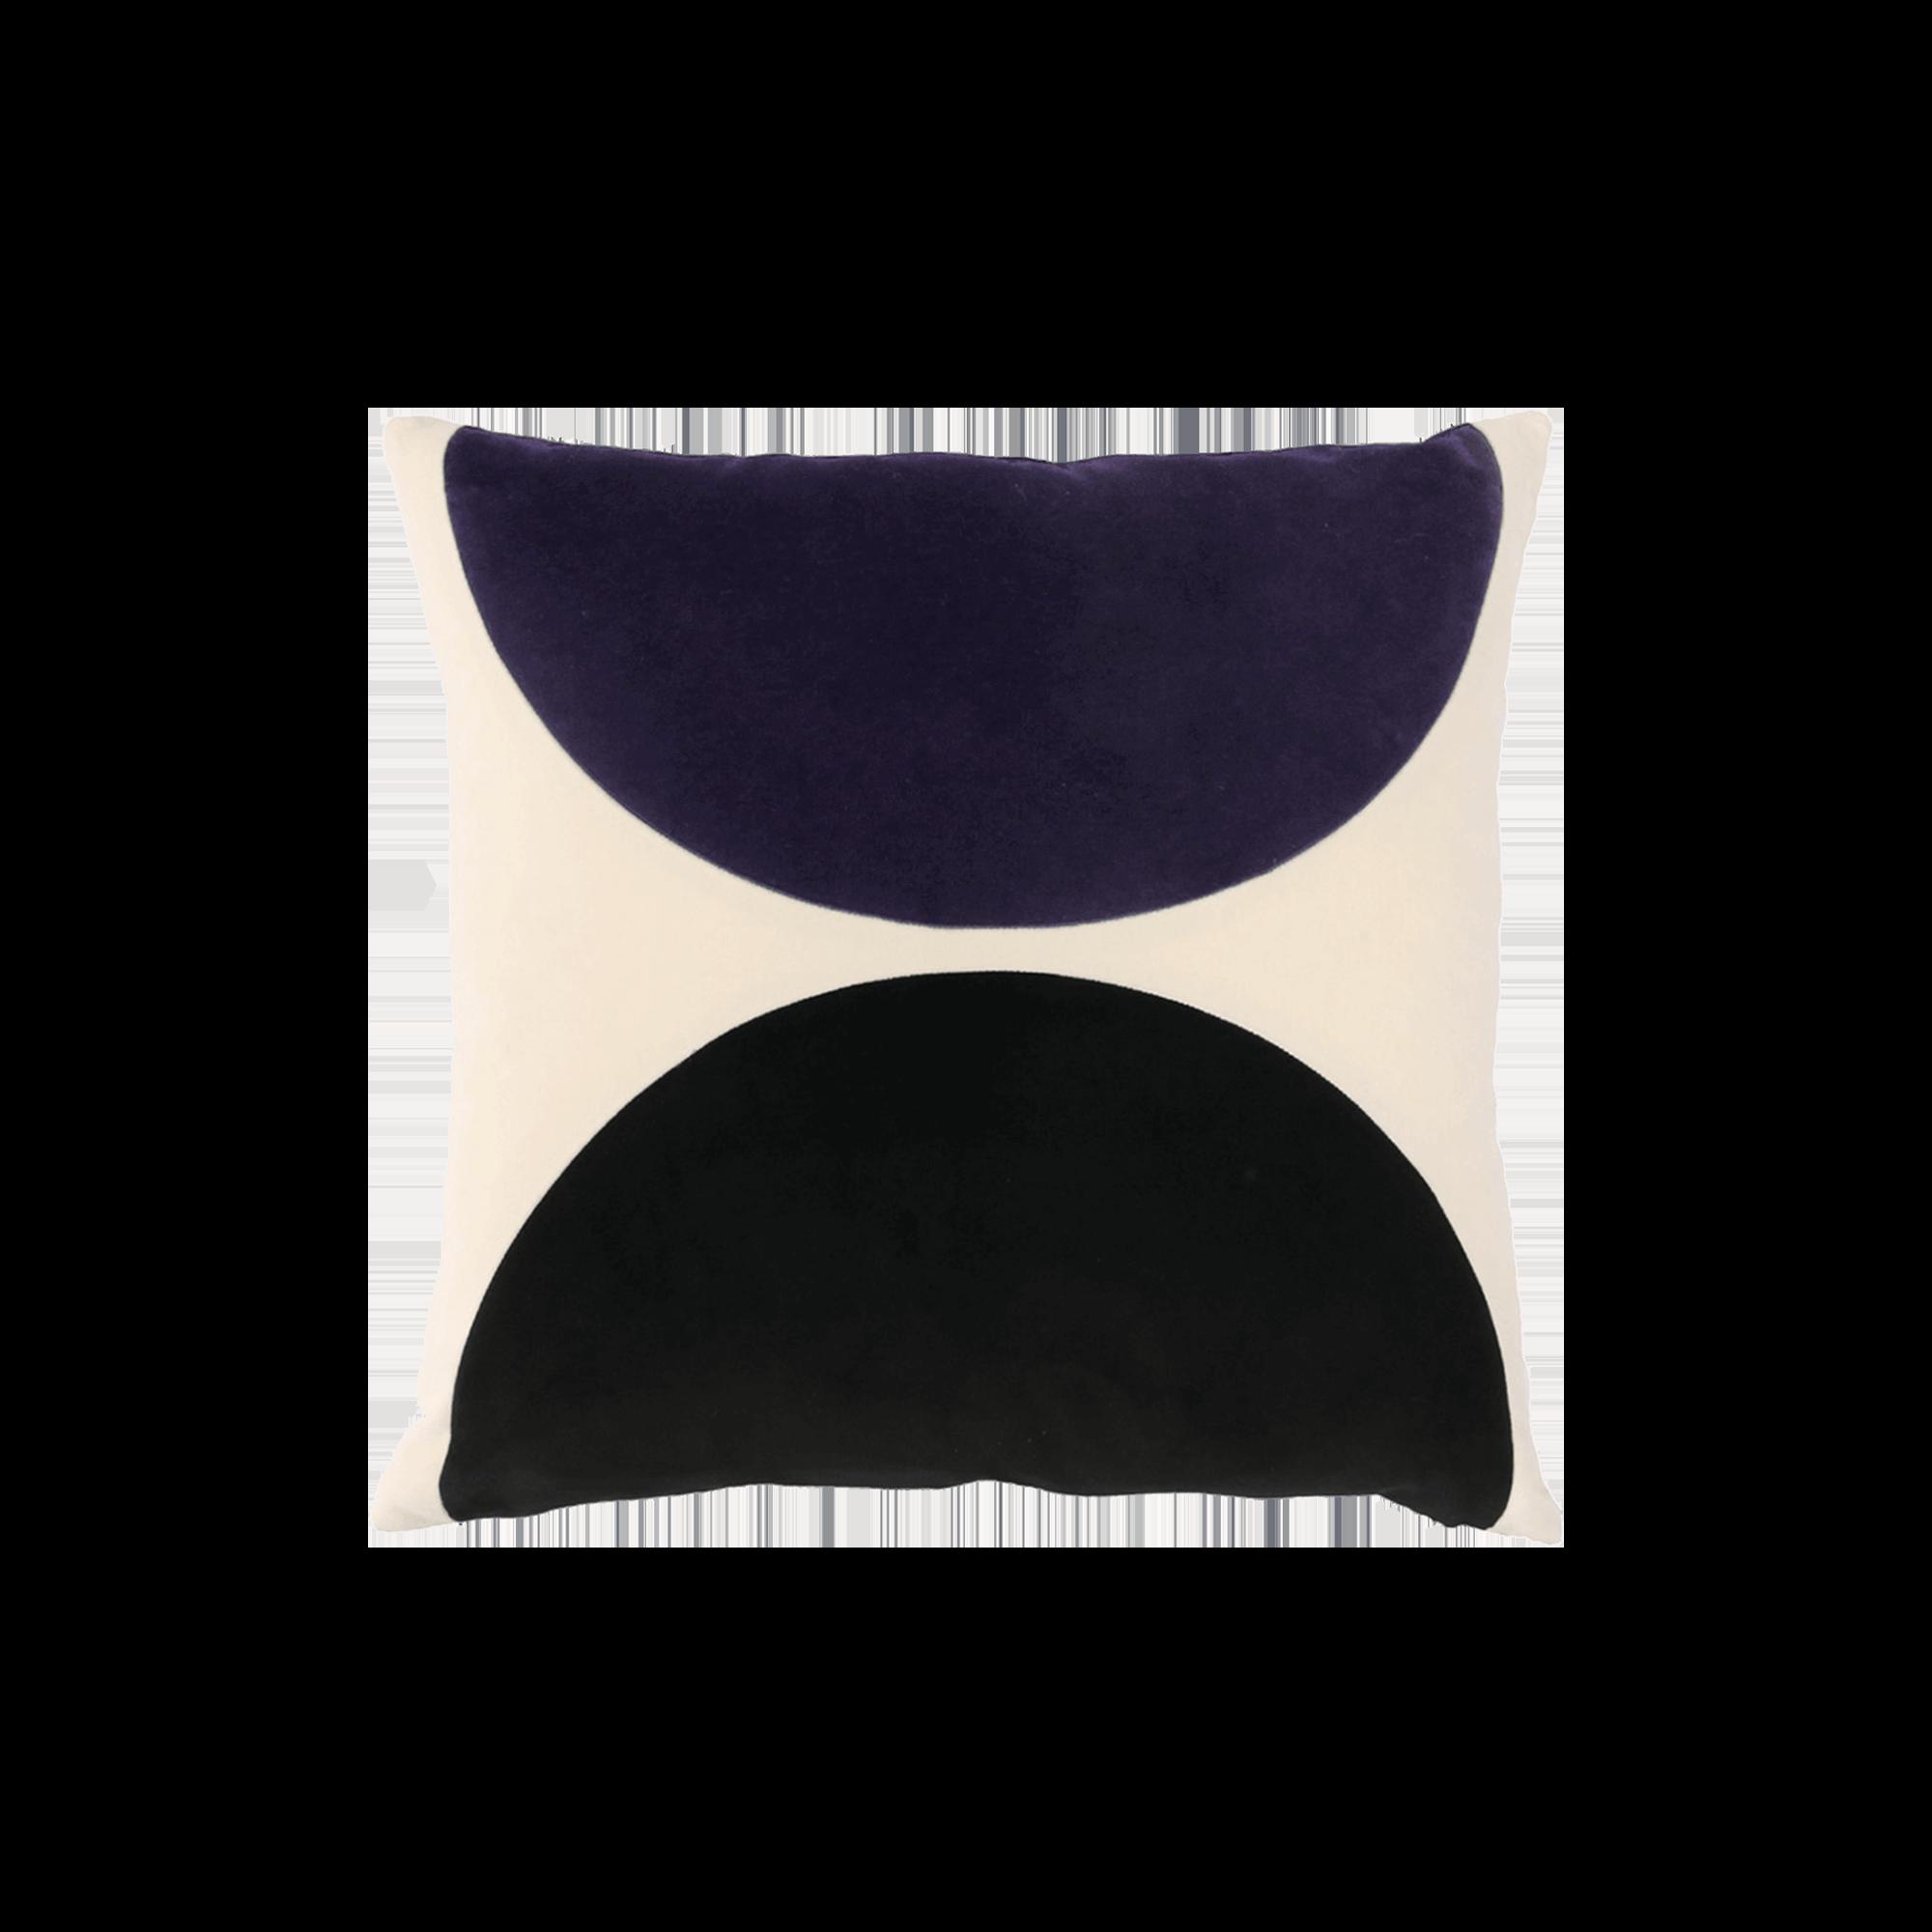 Eclipse - India Mahdavi